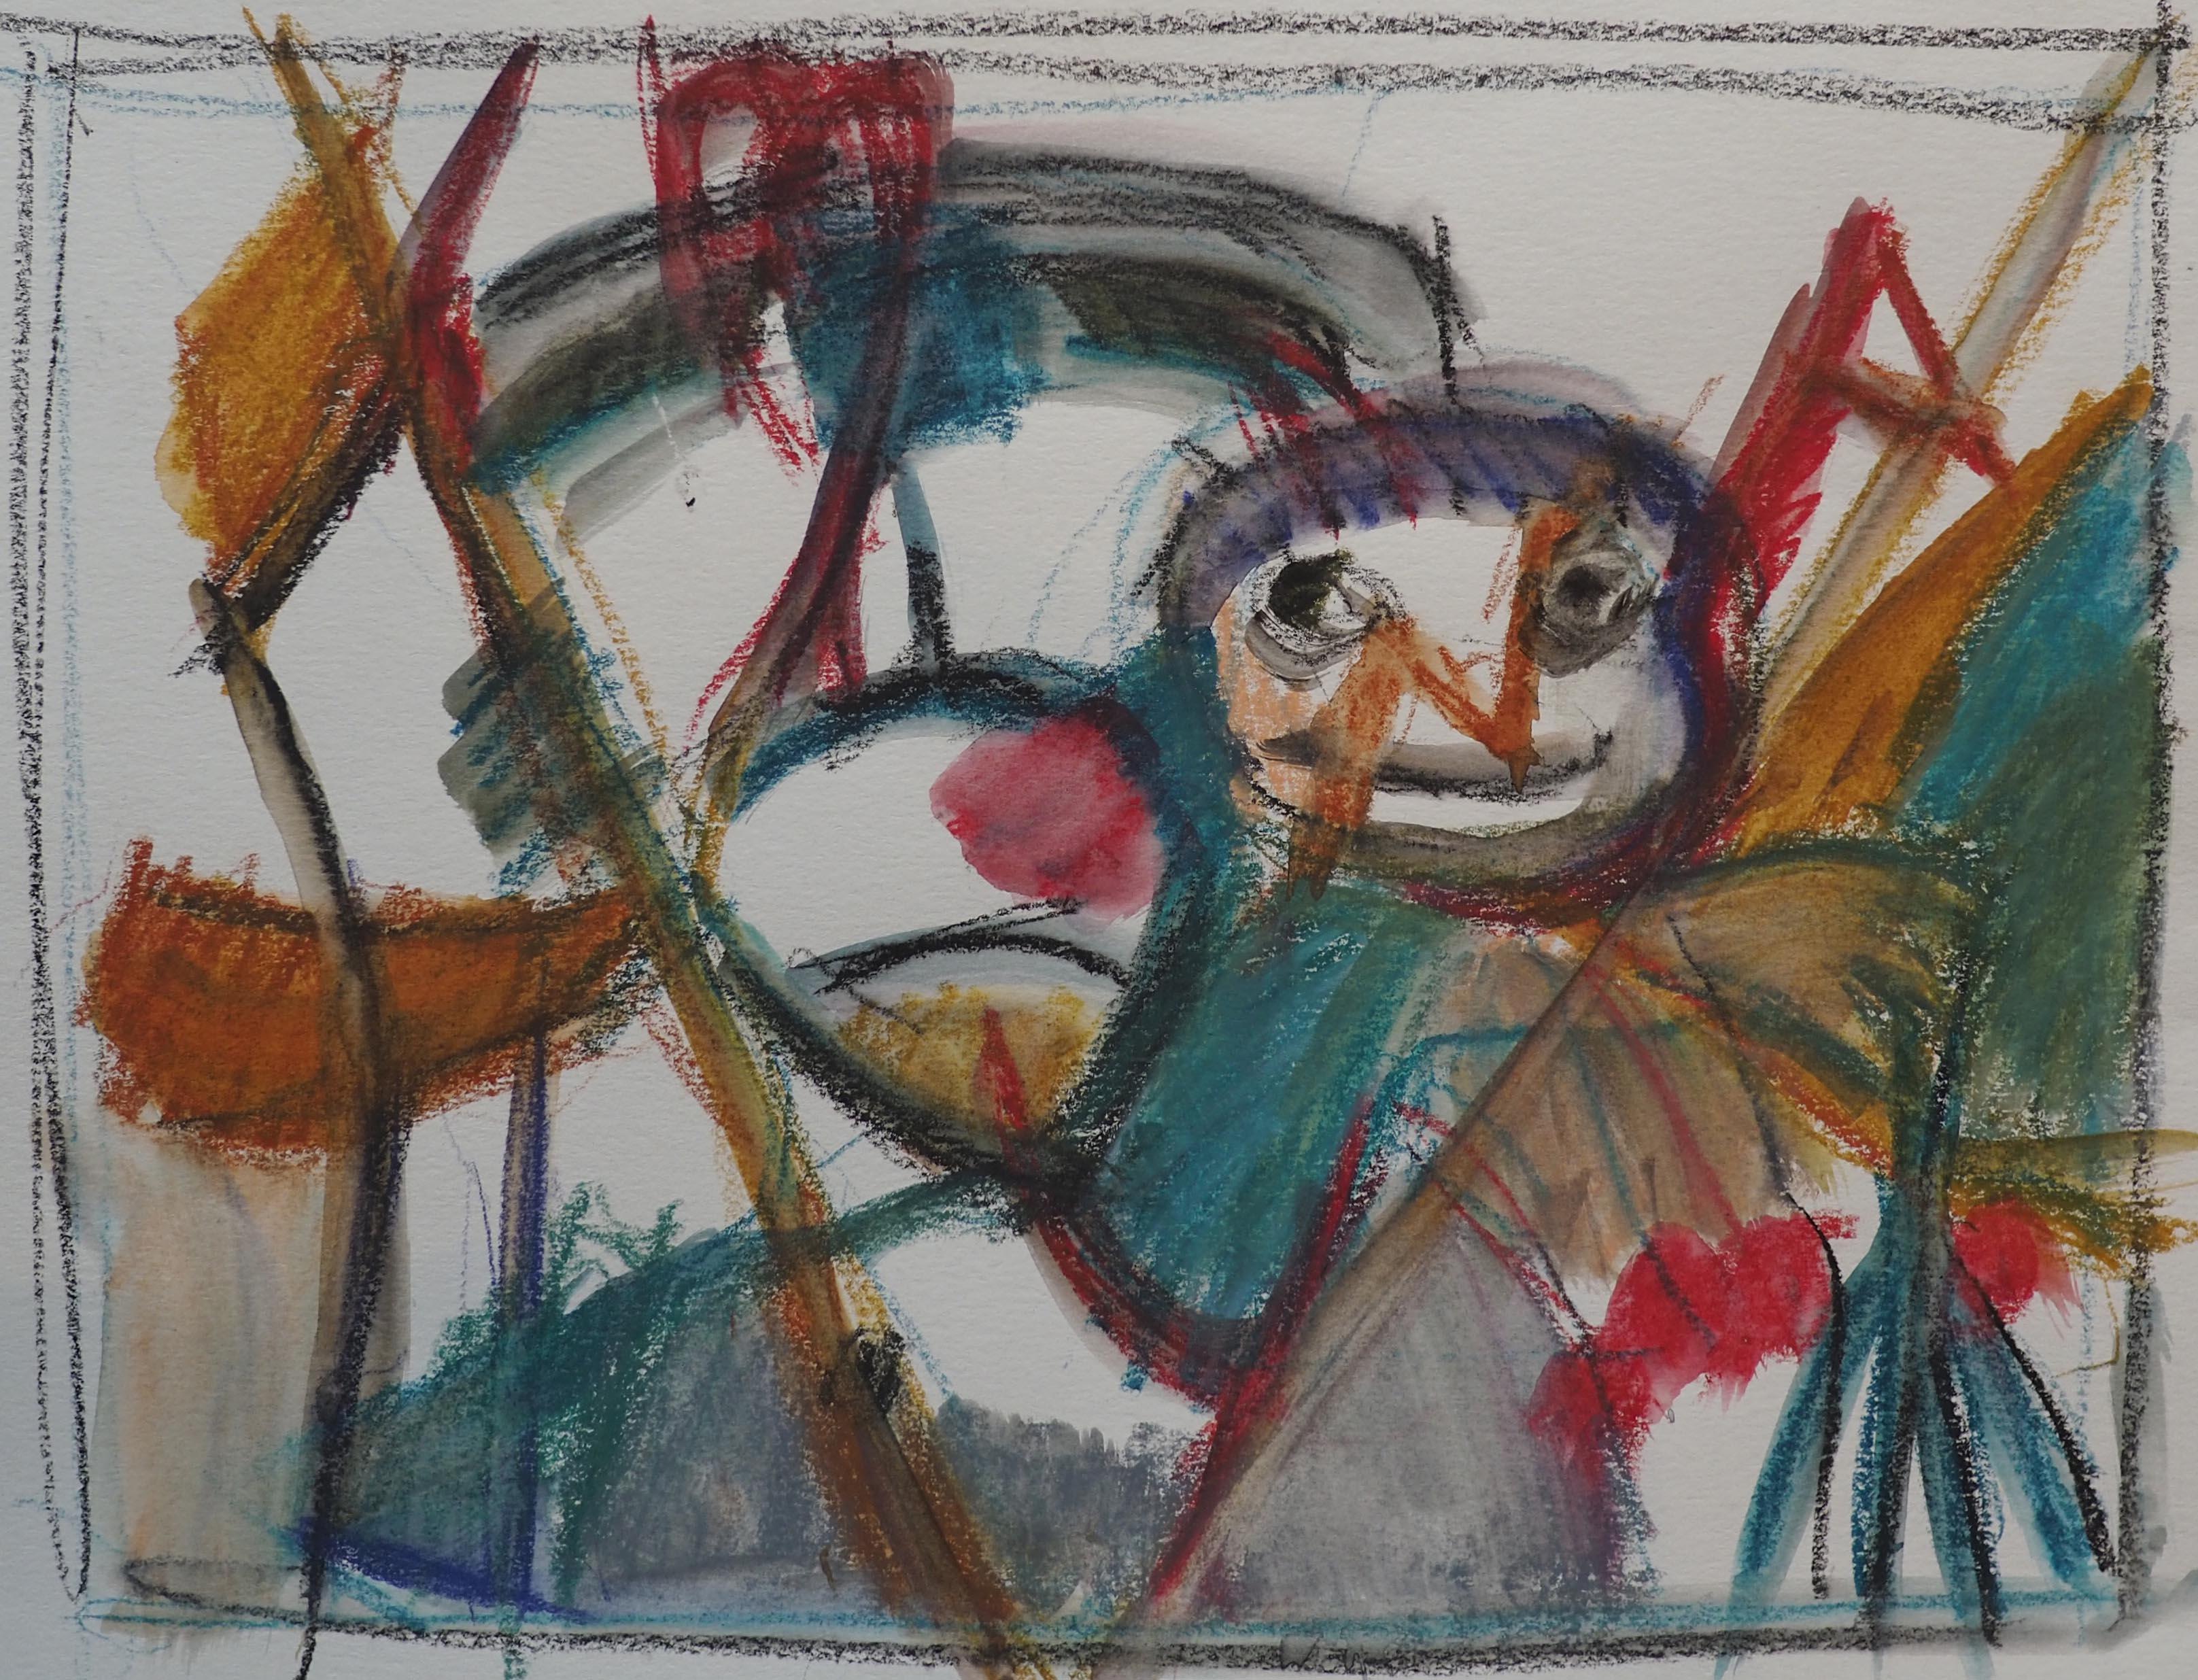 Martin-Paul Broenimann, 20x26